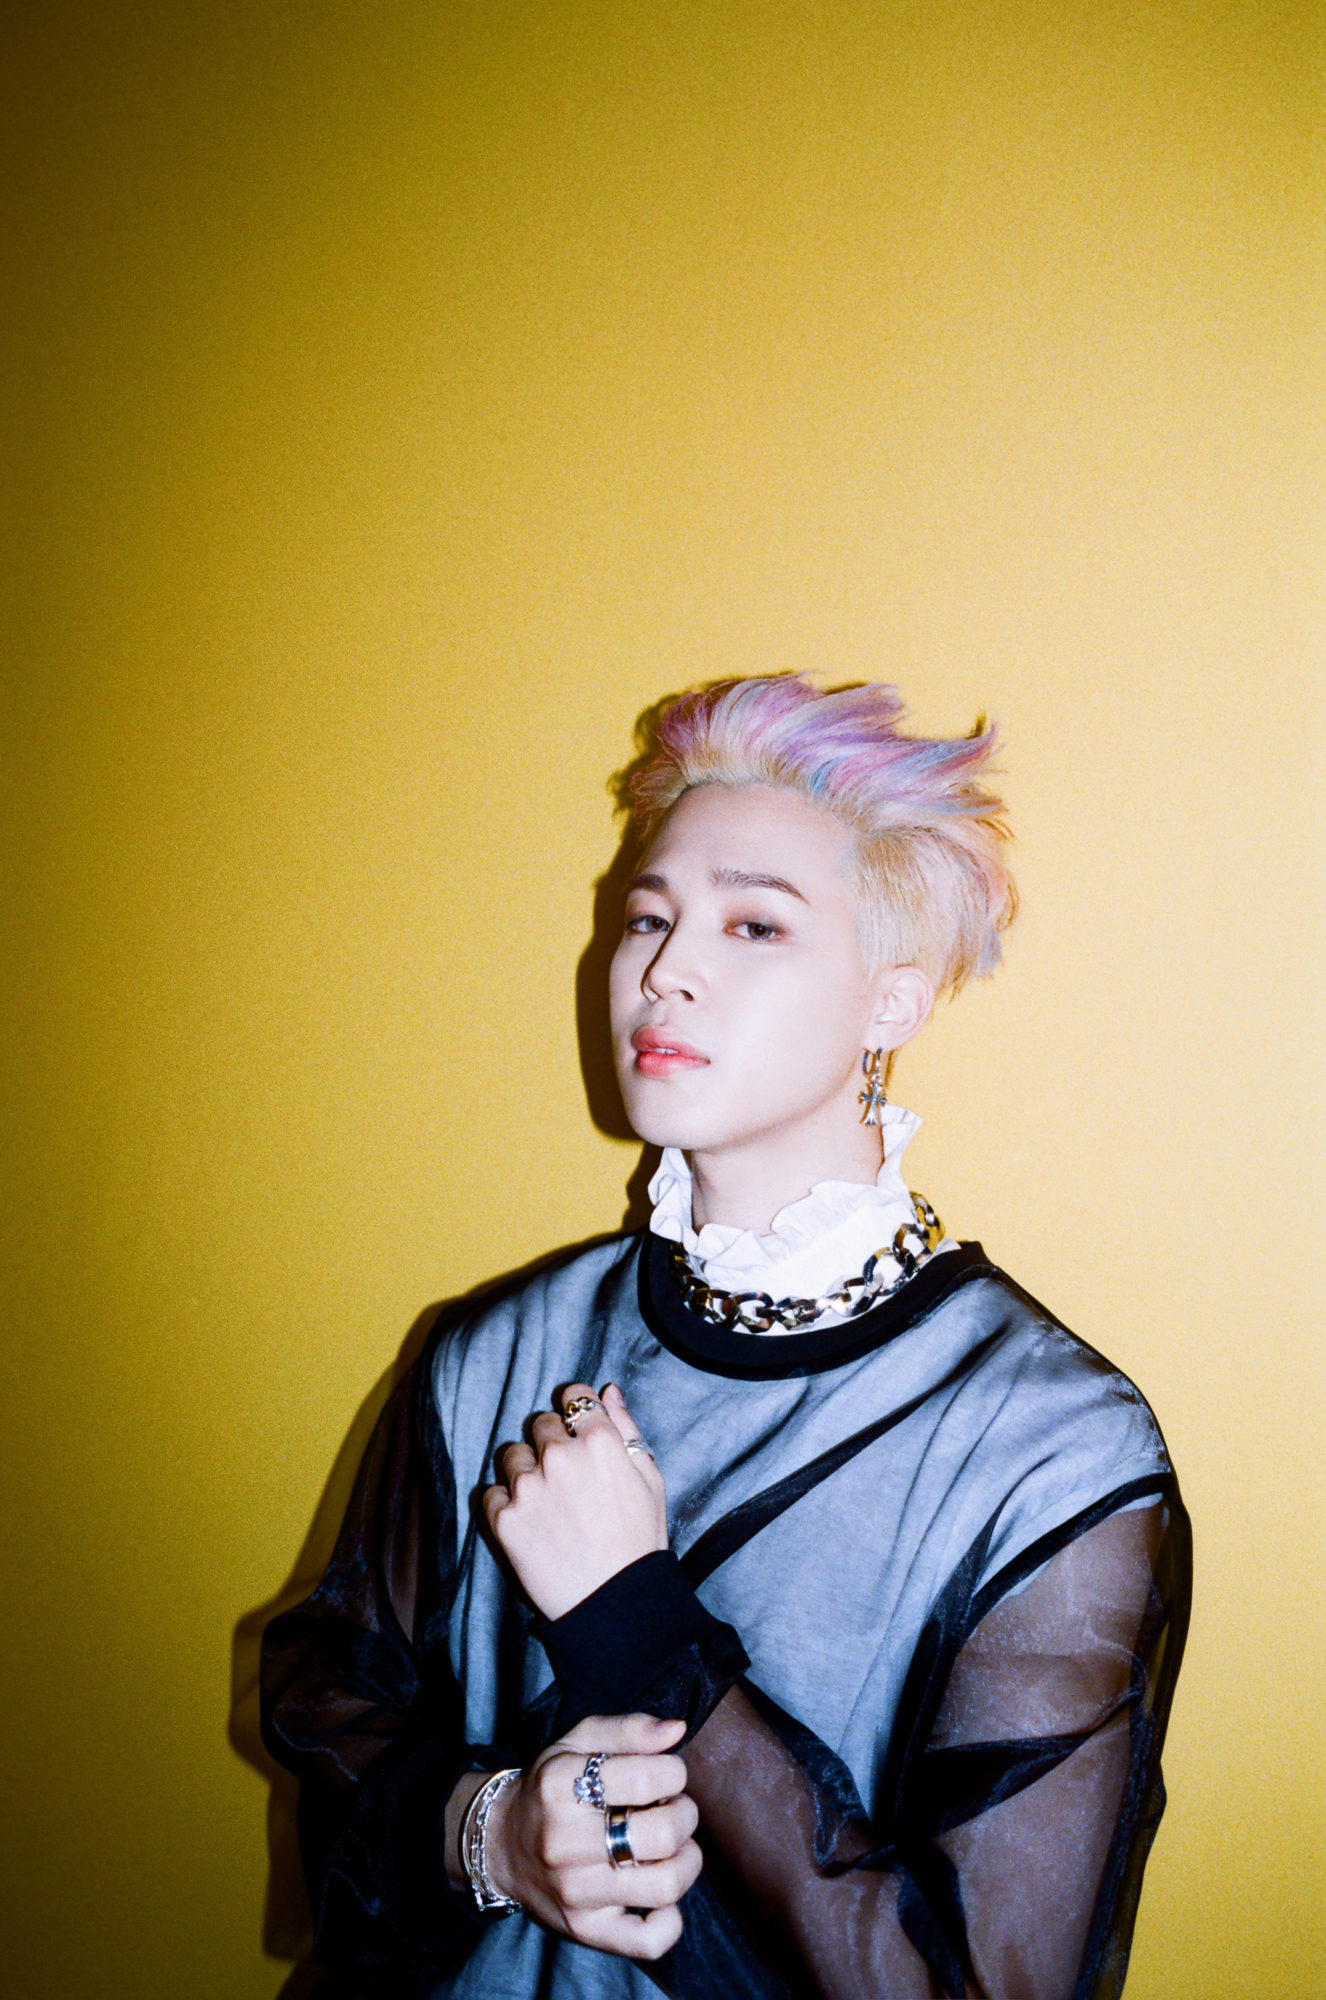 BTS Butter Concept Jimin